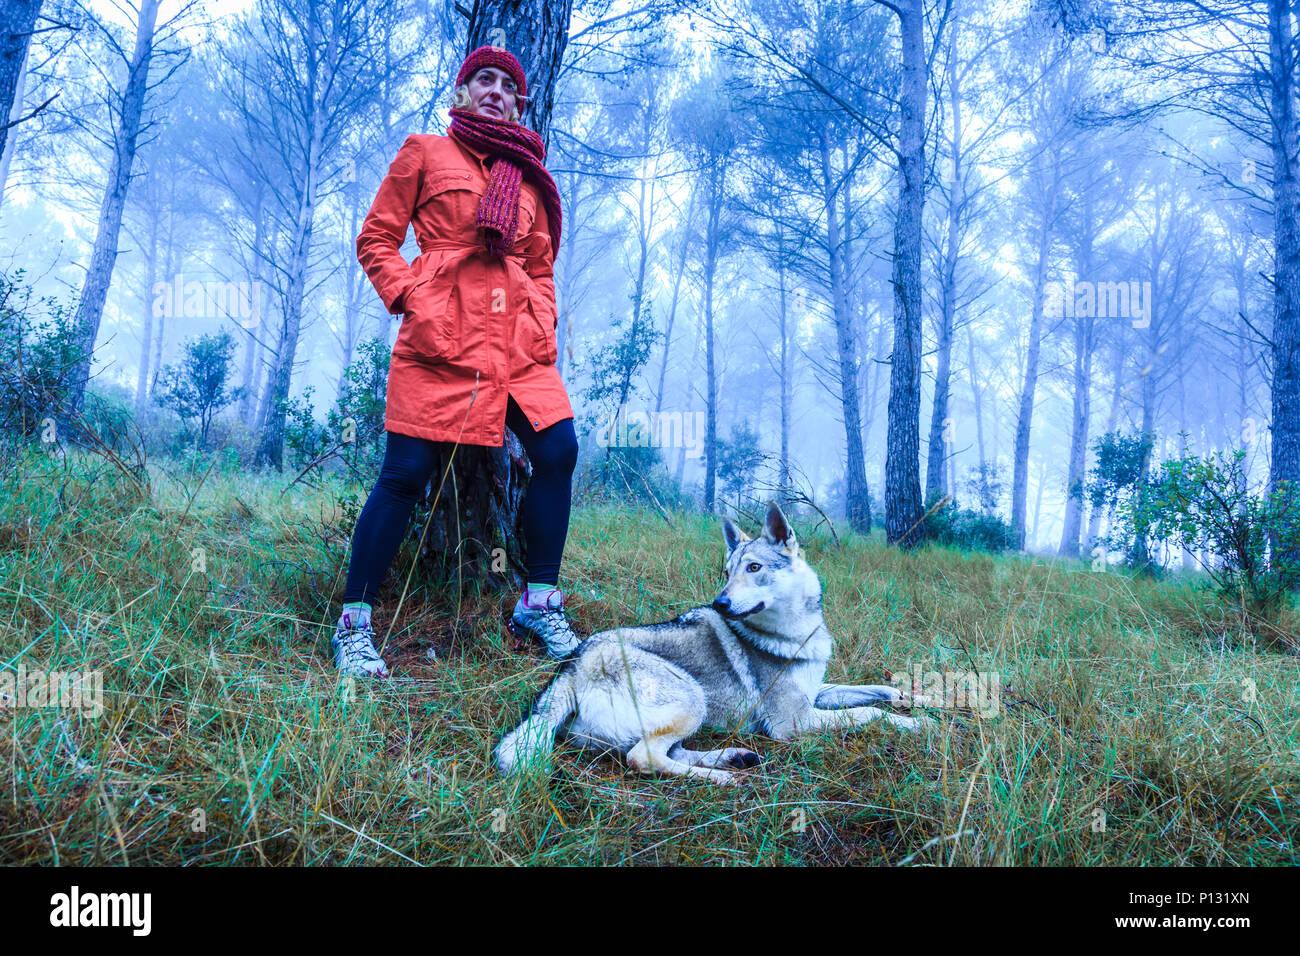 Woman in a pine grove with a Czechoslovakian wolfdog. Tierra Estella County, Navarre, Spain, Europe. - Stock Image